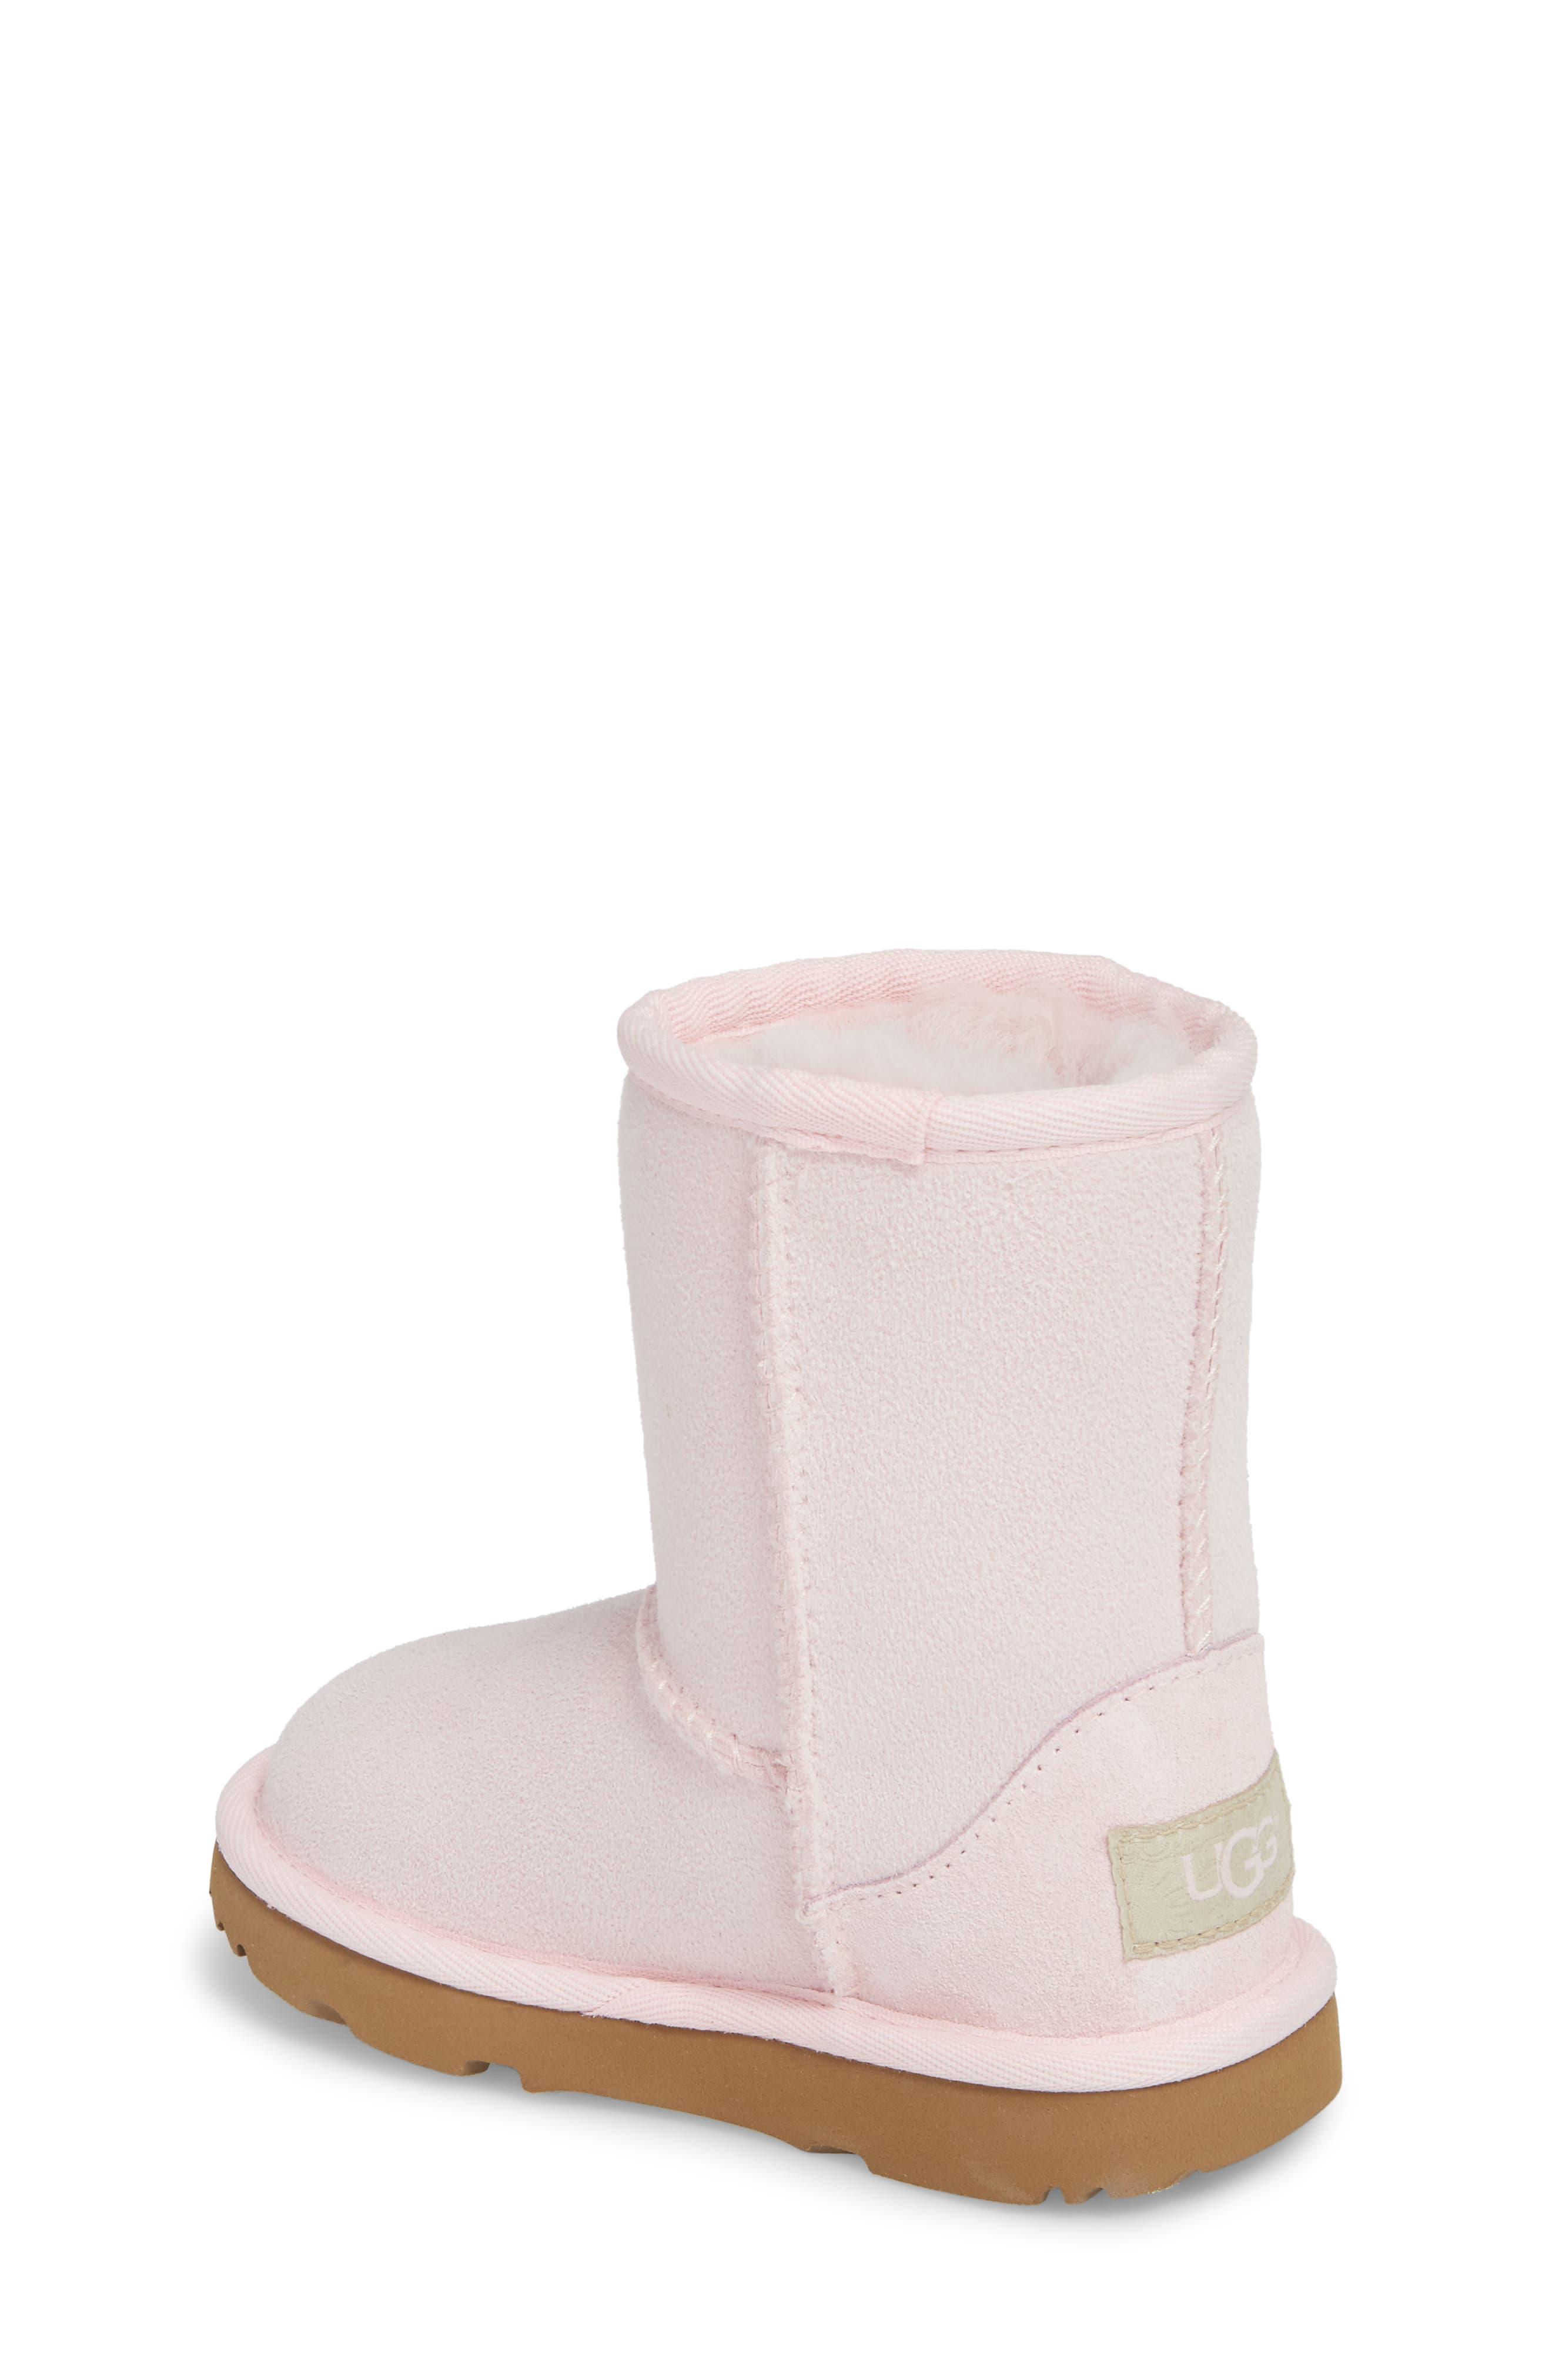 Alternate Image 2  - UGG® Classic II Water Resistant Genuine Shearling Boot (Walker, Toddler, Little Kid & Big Kid)